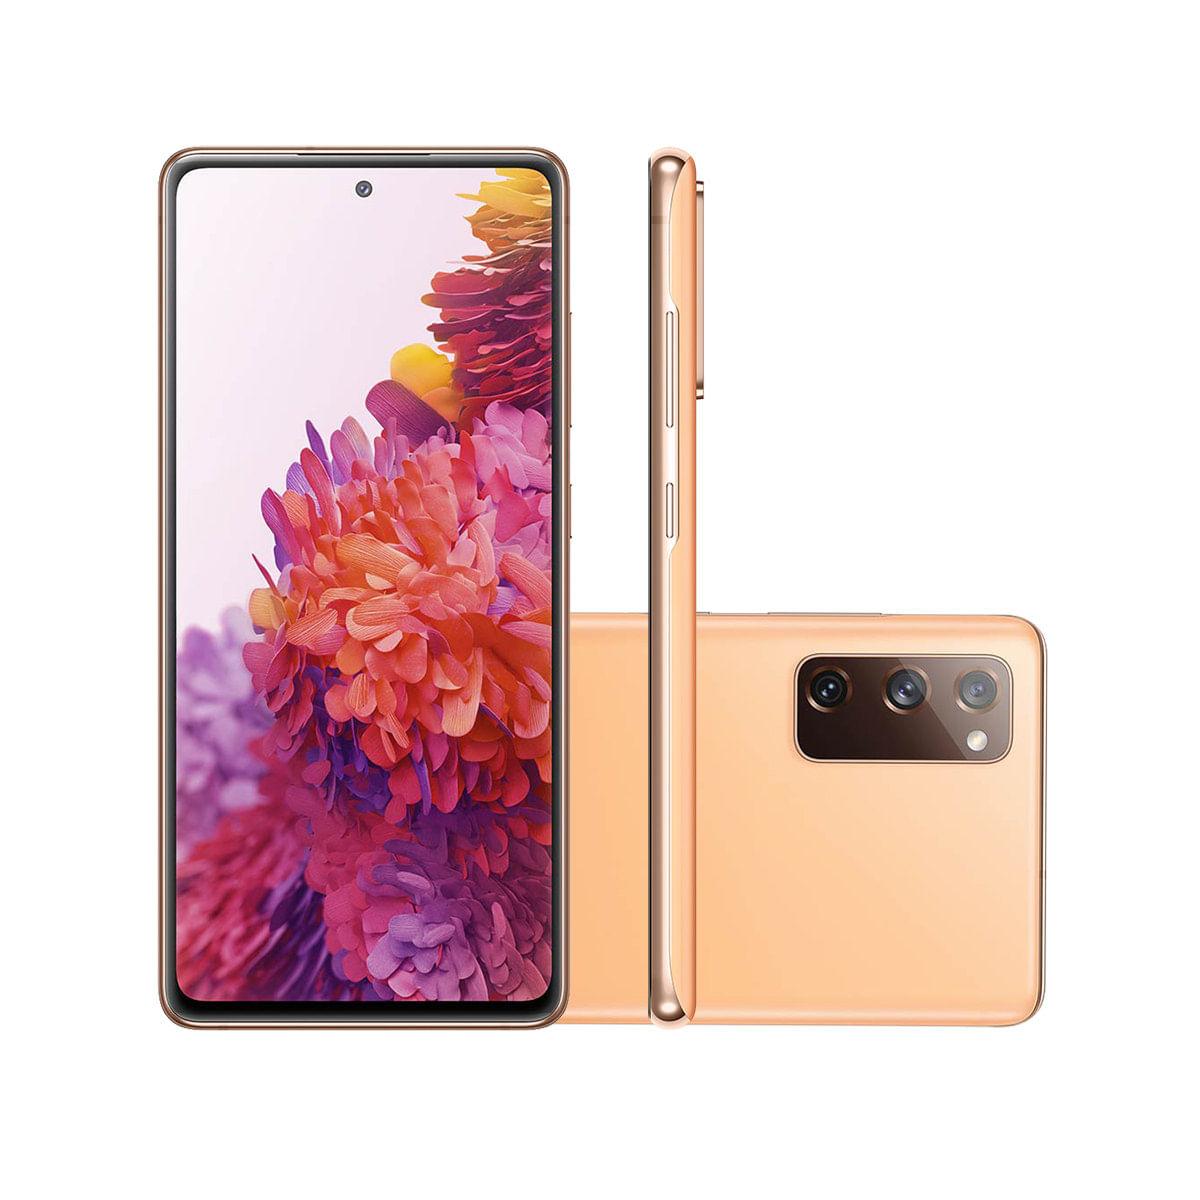 "Smartphone Samsung Galaxy S20 FE 128GB Cloud Orange 4G Tela 6.5"" Câmera Frontal 32MP Android 6.6"